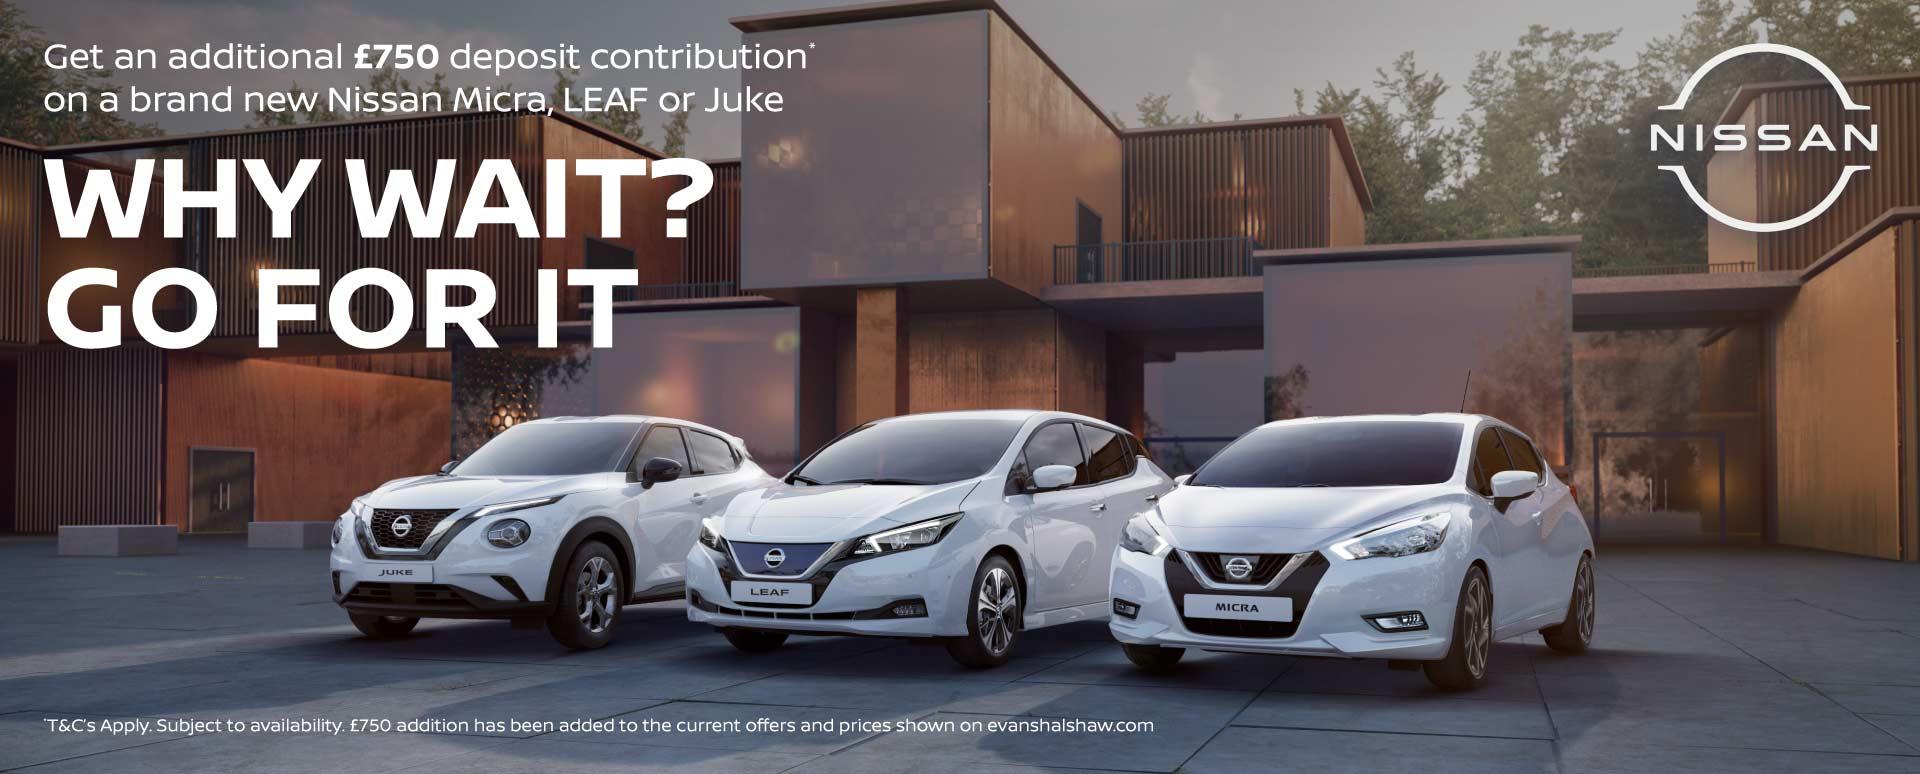 Nissan Why Wait?